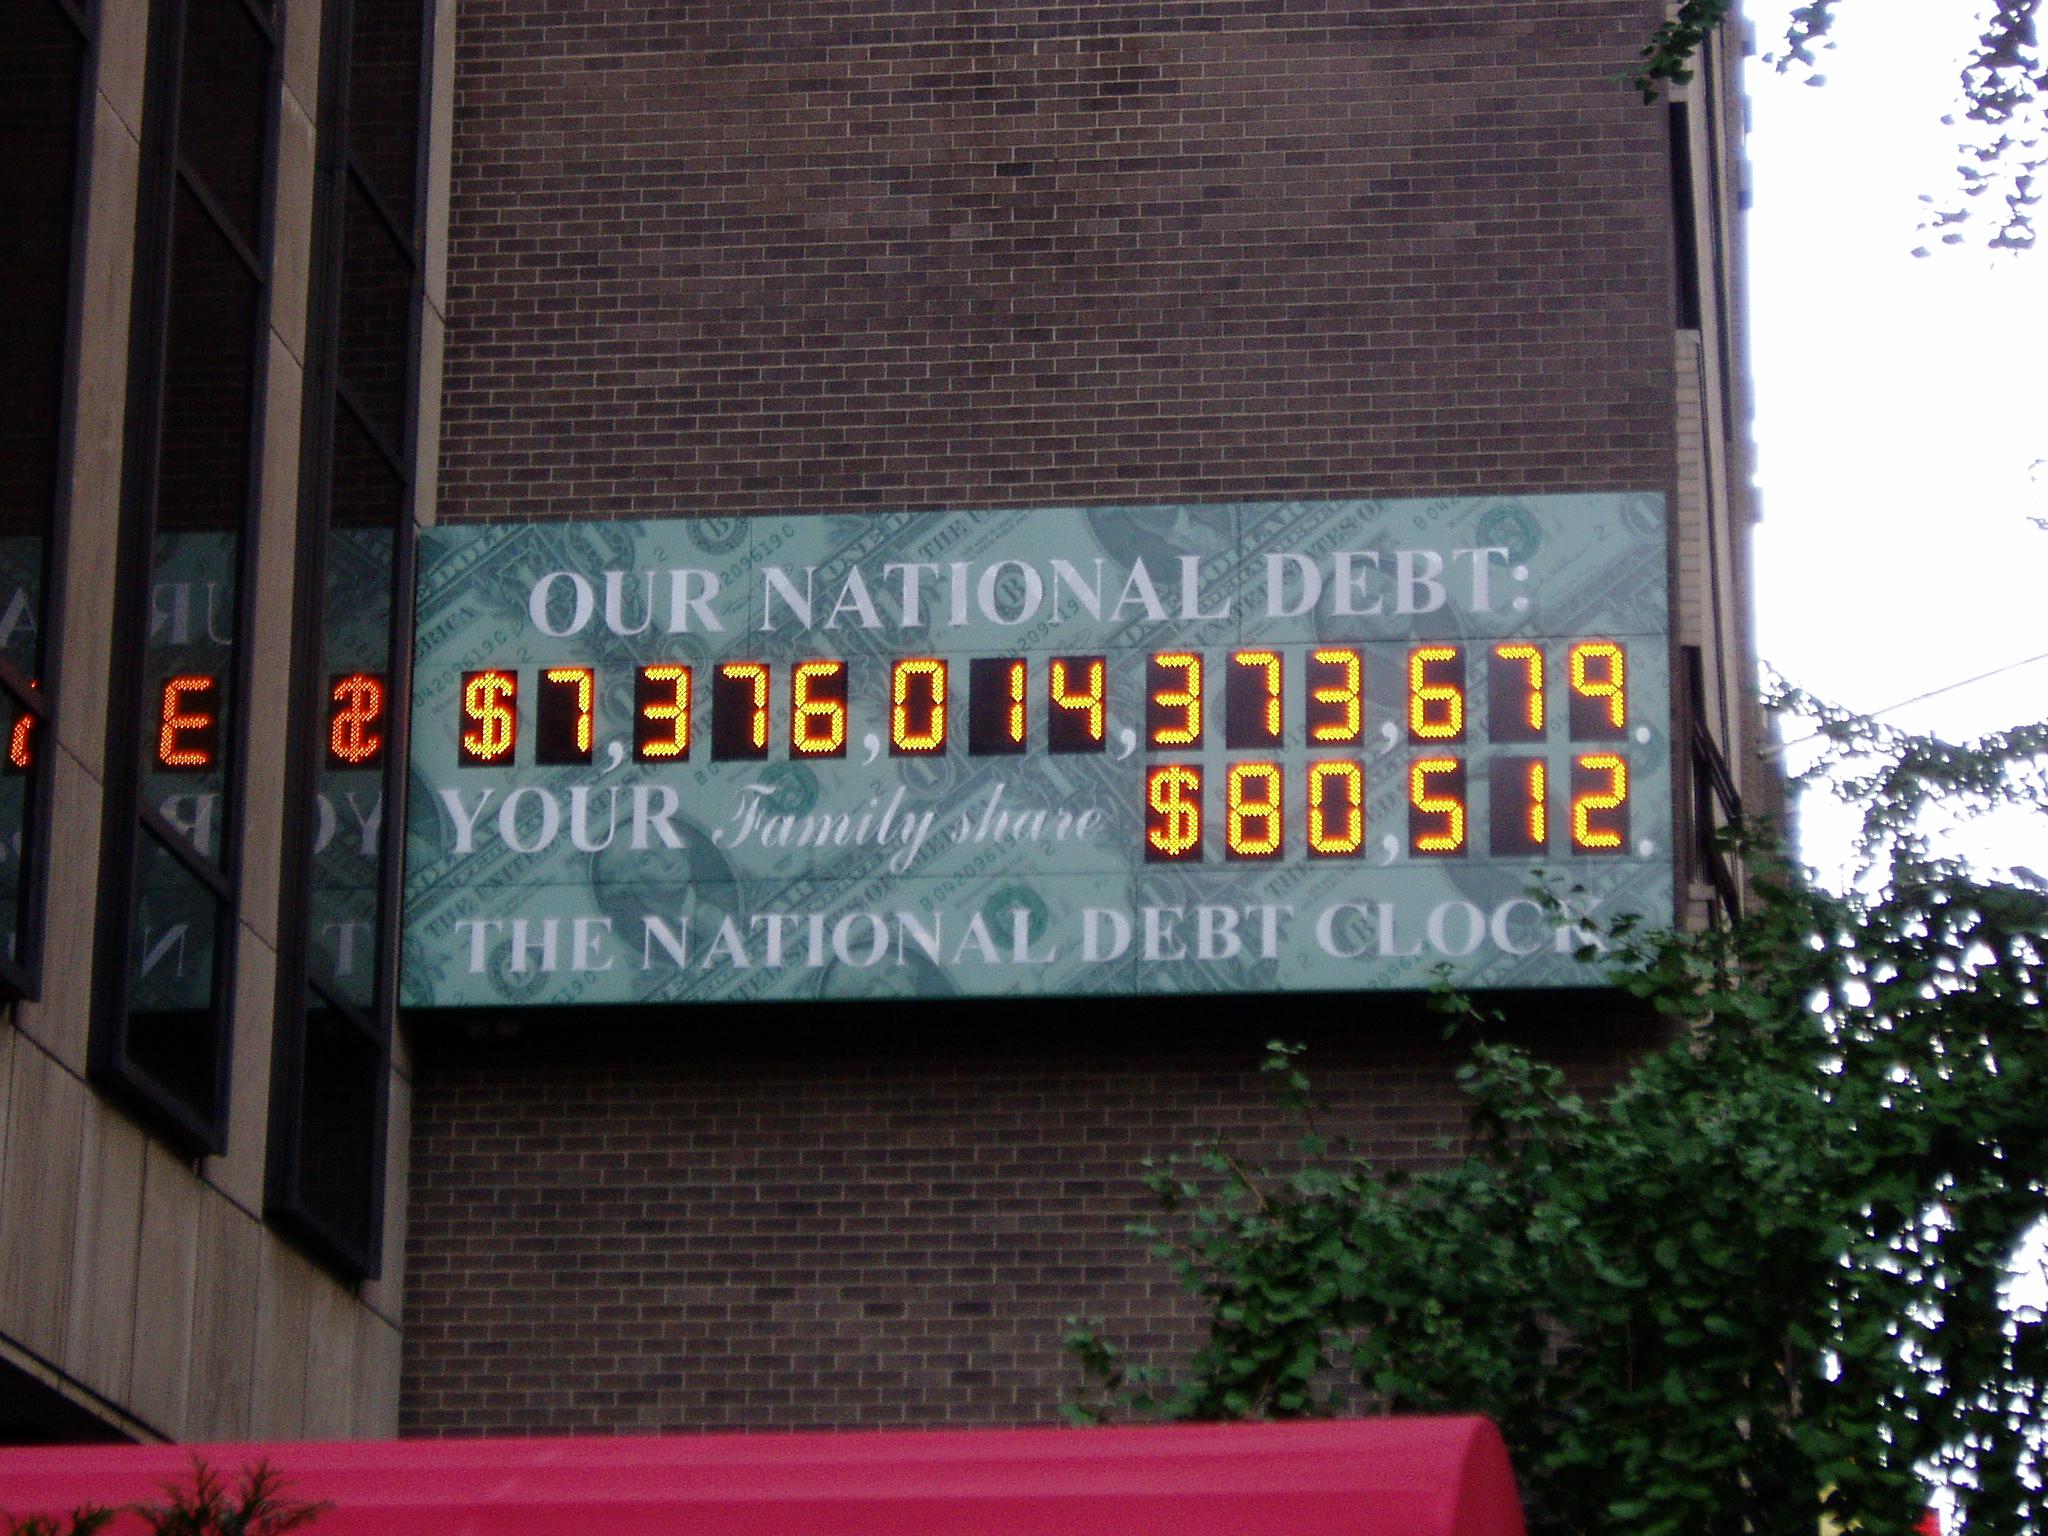 Us Debt Holders Chart: National Debt Clock - Wikipedia,Chart